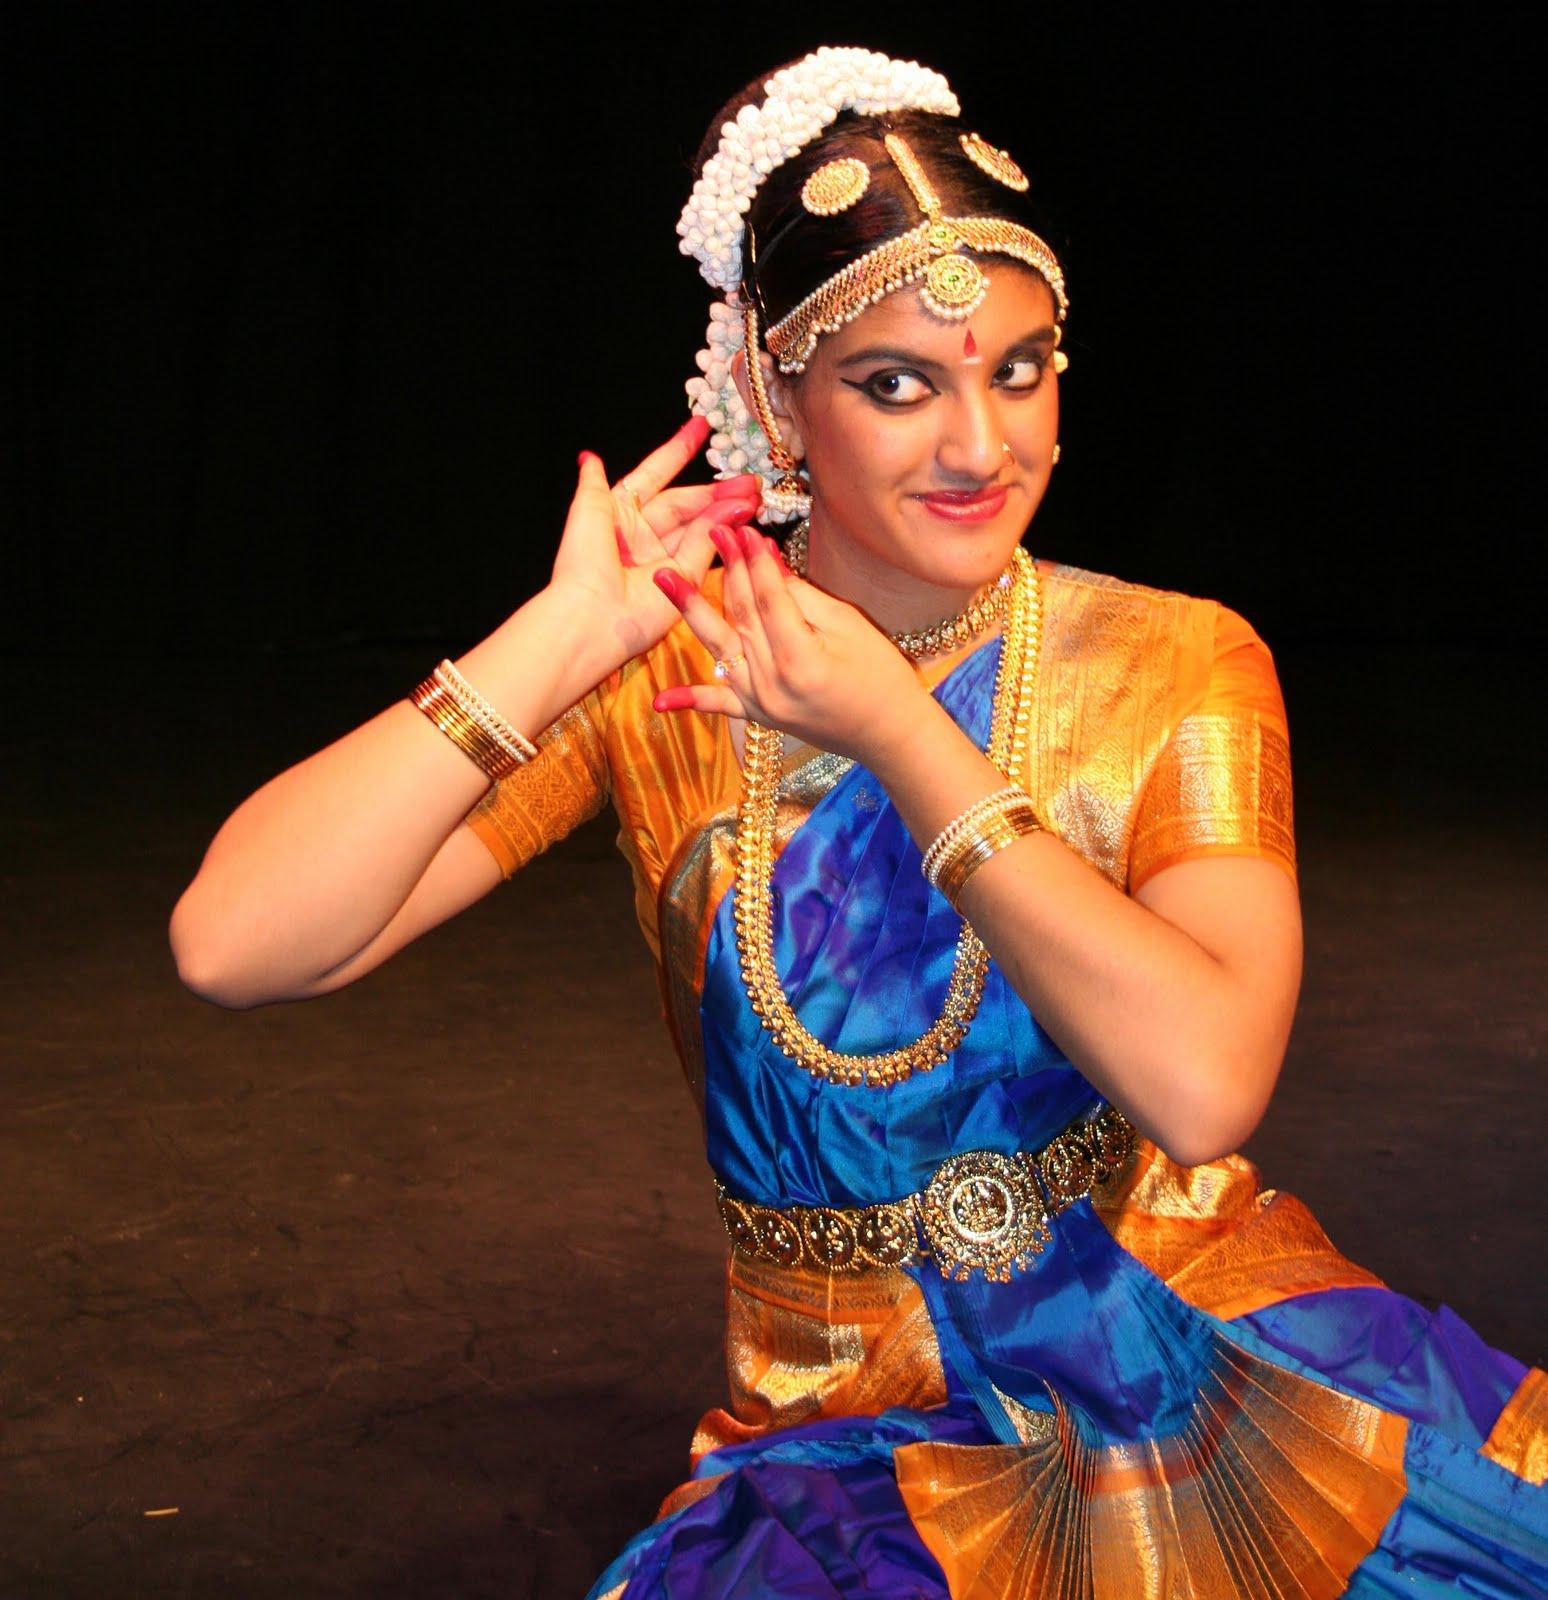 classical dance Samarpan - indian classical dance festival 3k likes samarpan - a tribute to indian classical dance festival is an annual event in the coastal city of.